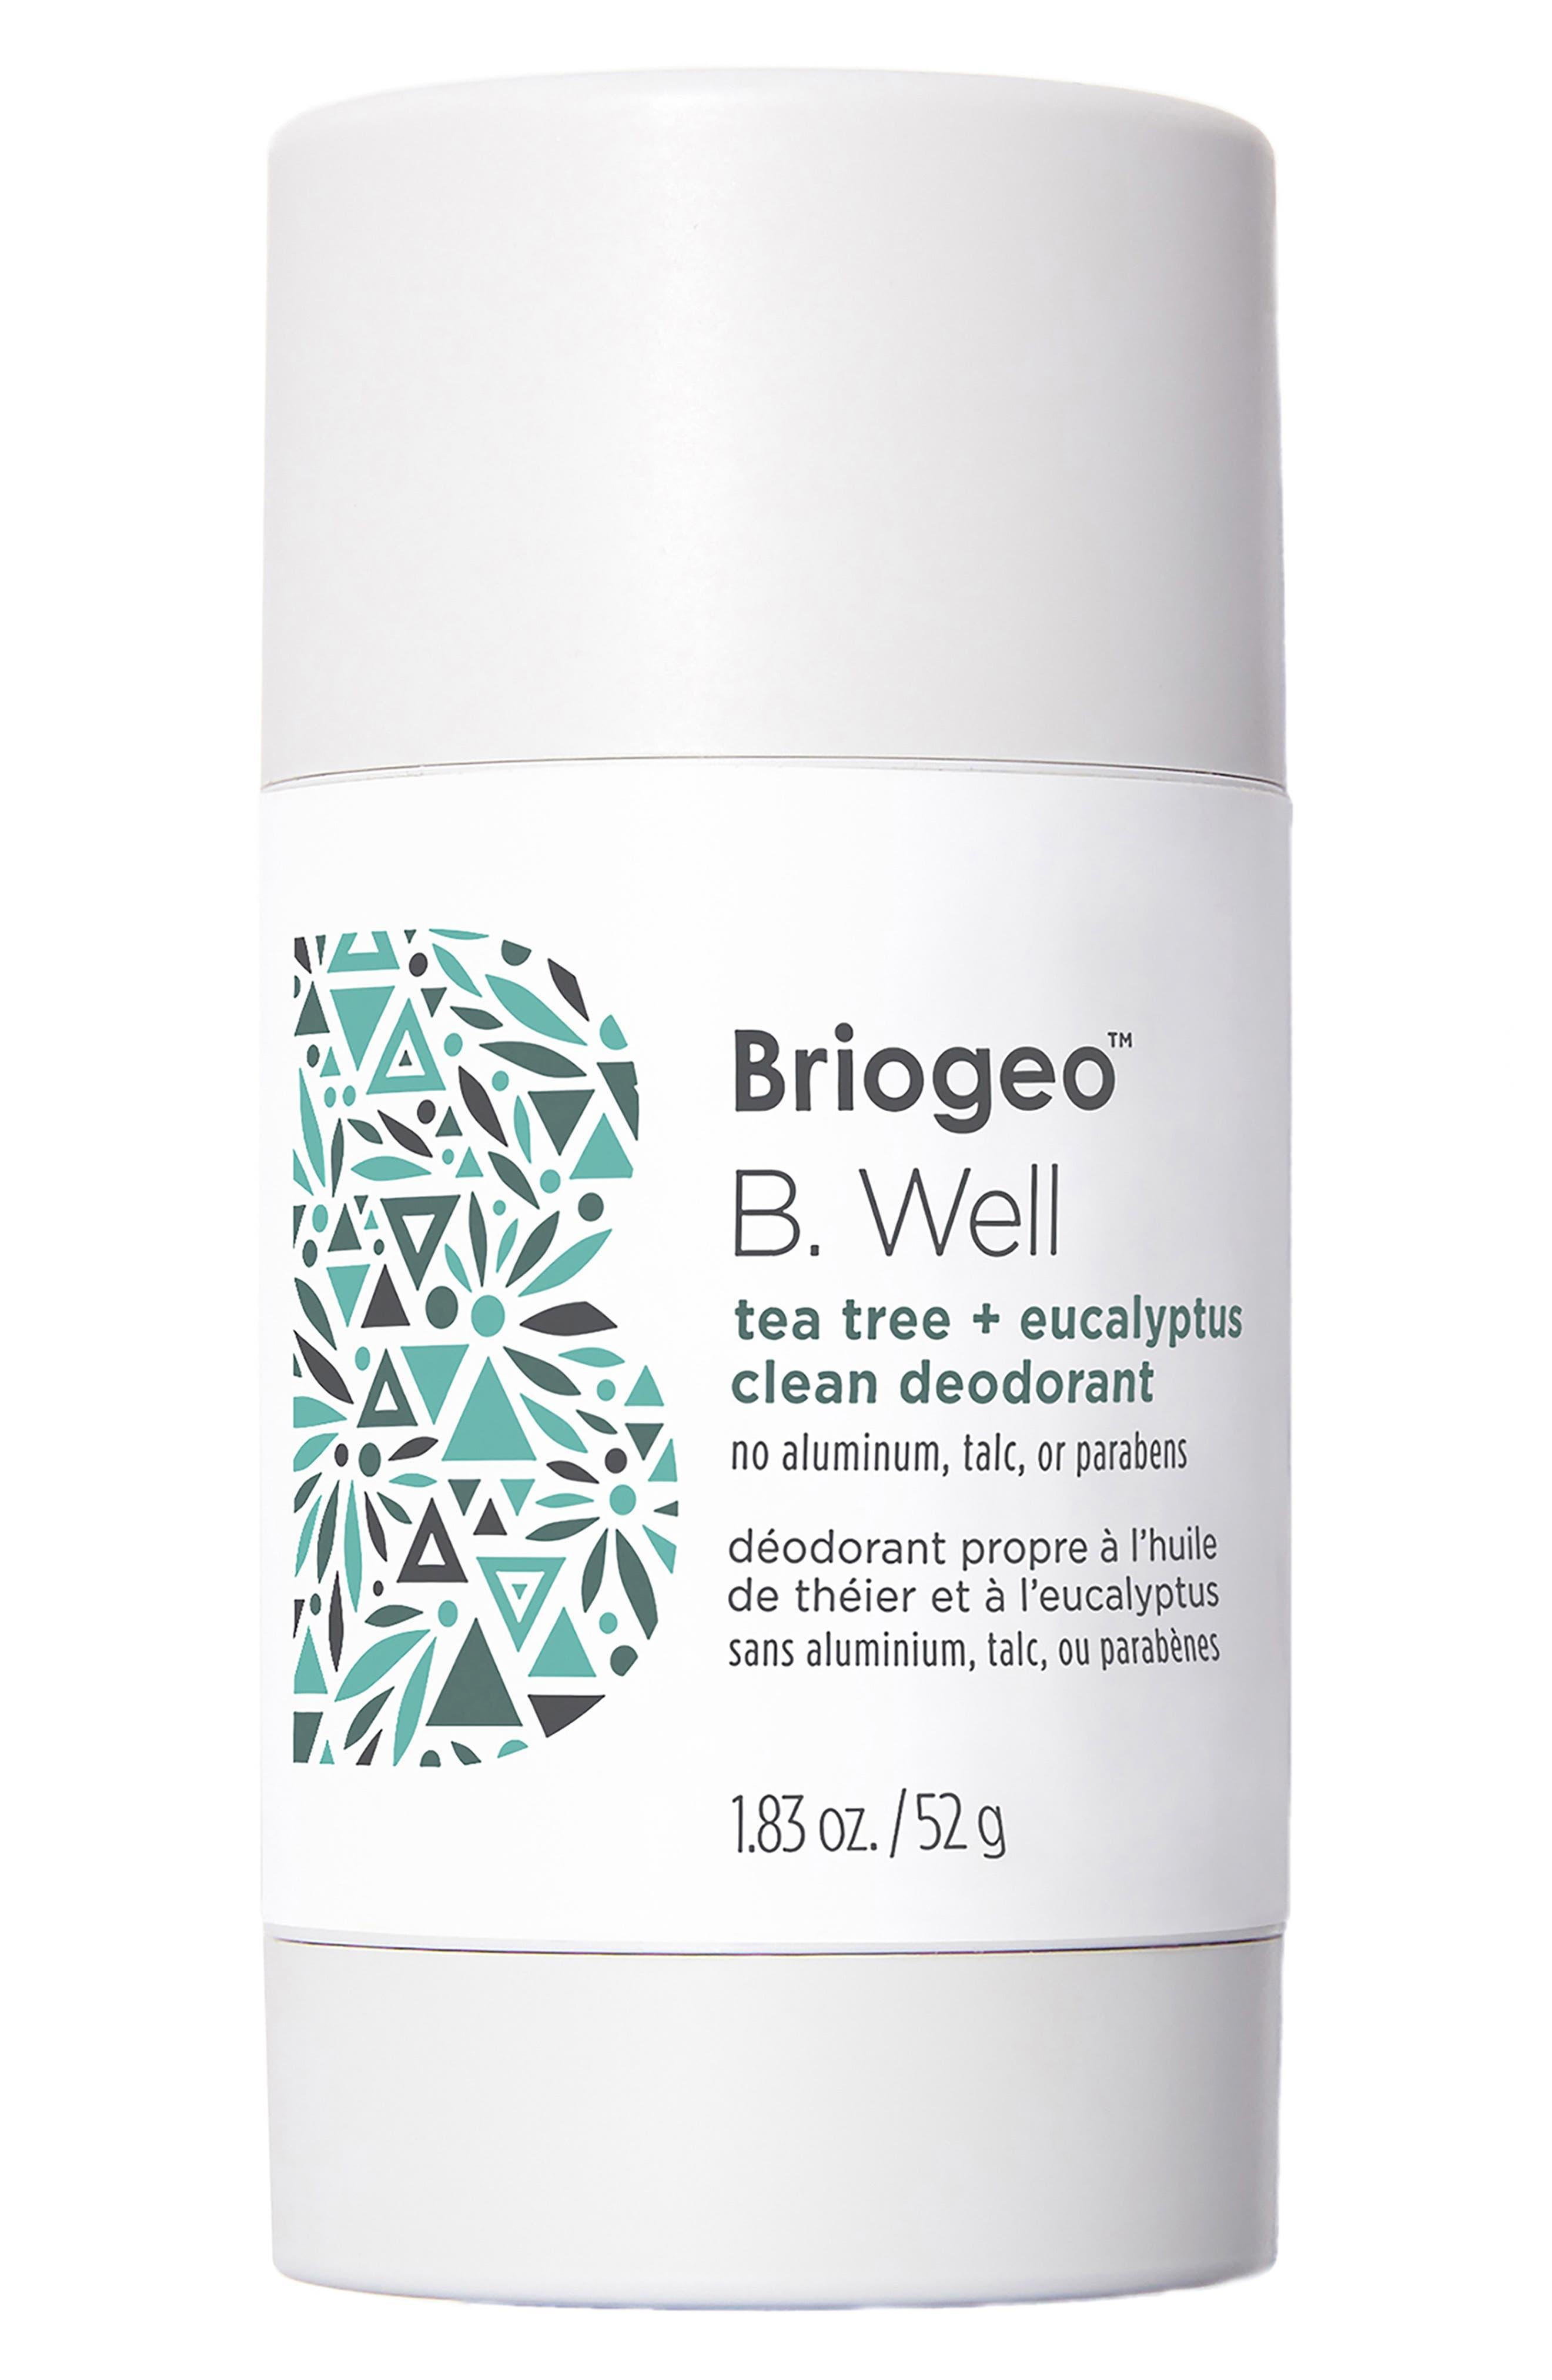 B. Well Tea Tree + Eucalyptus Clean Deodorant